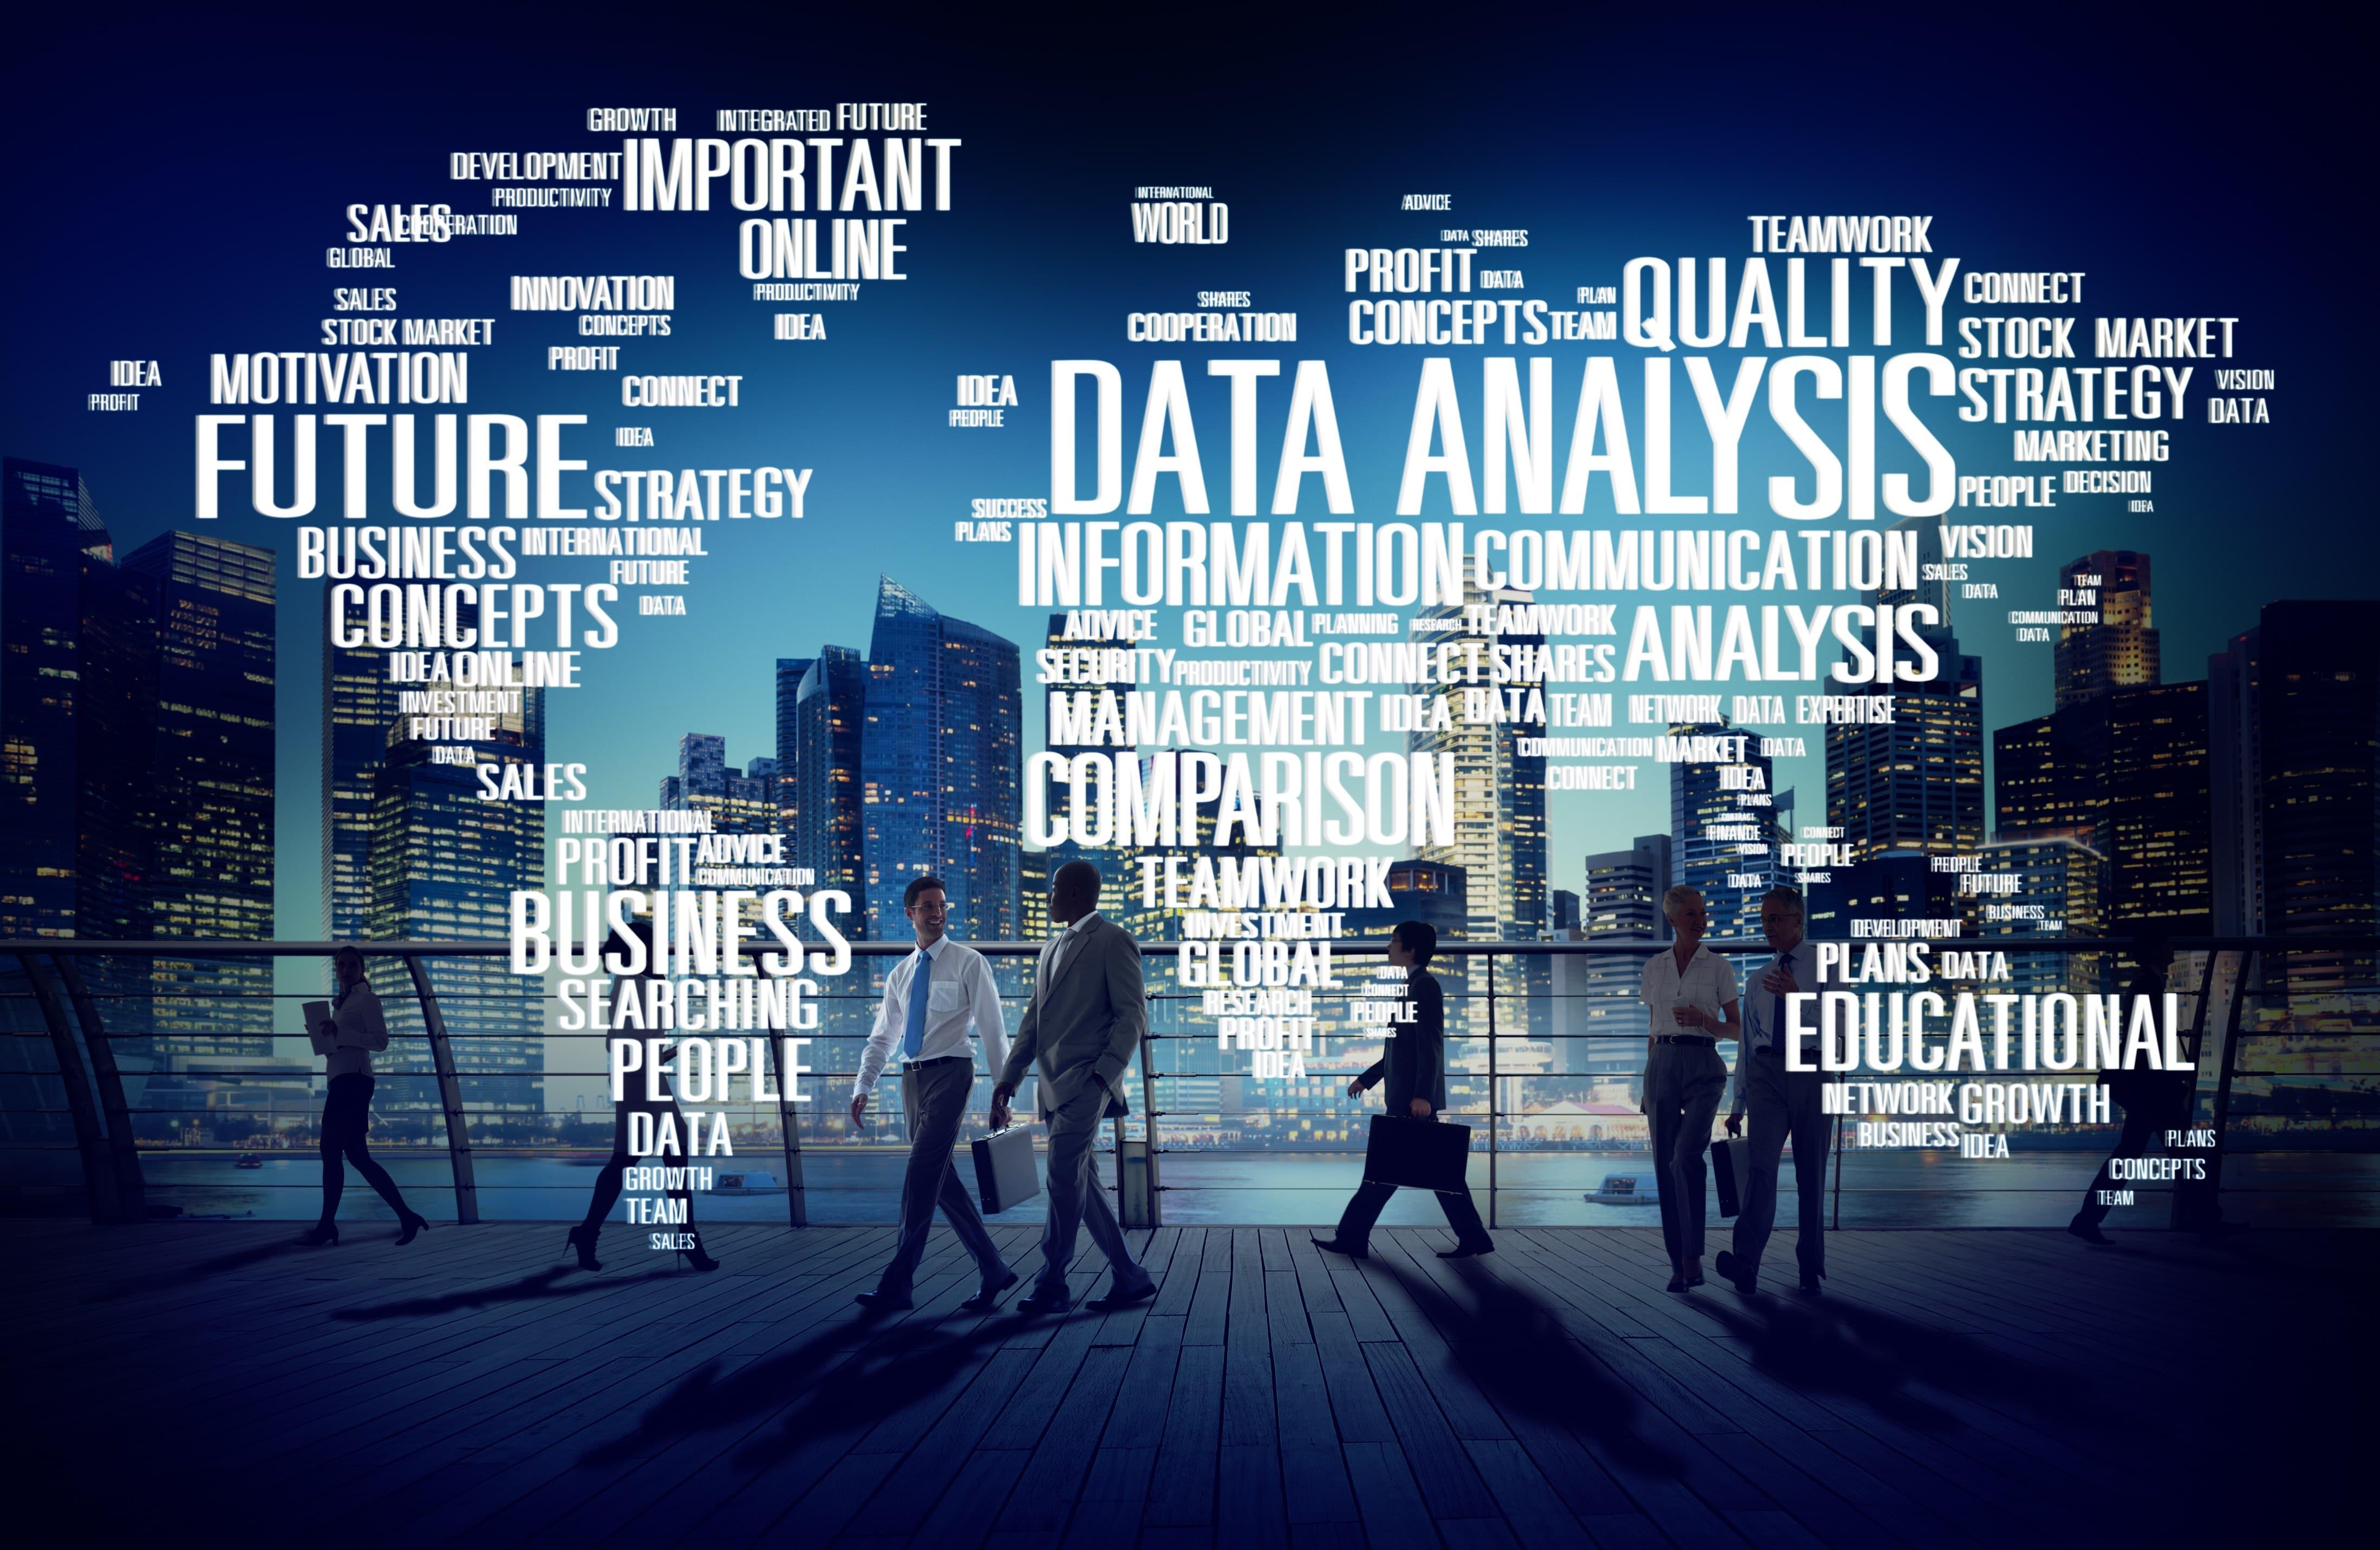 Big Data e Analytics - Integrare Analytics e Big Data nel Digital Business nell'era della Digital Transformation - Web Agency Ragusa & SEO Ragusa